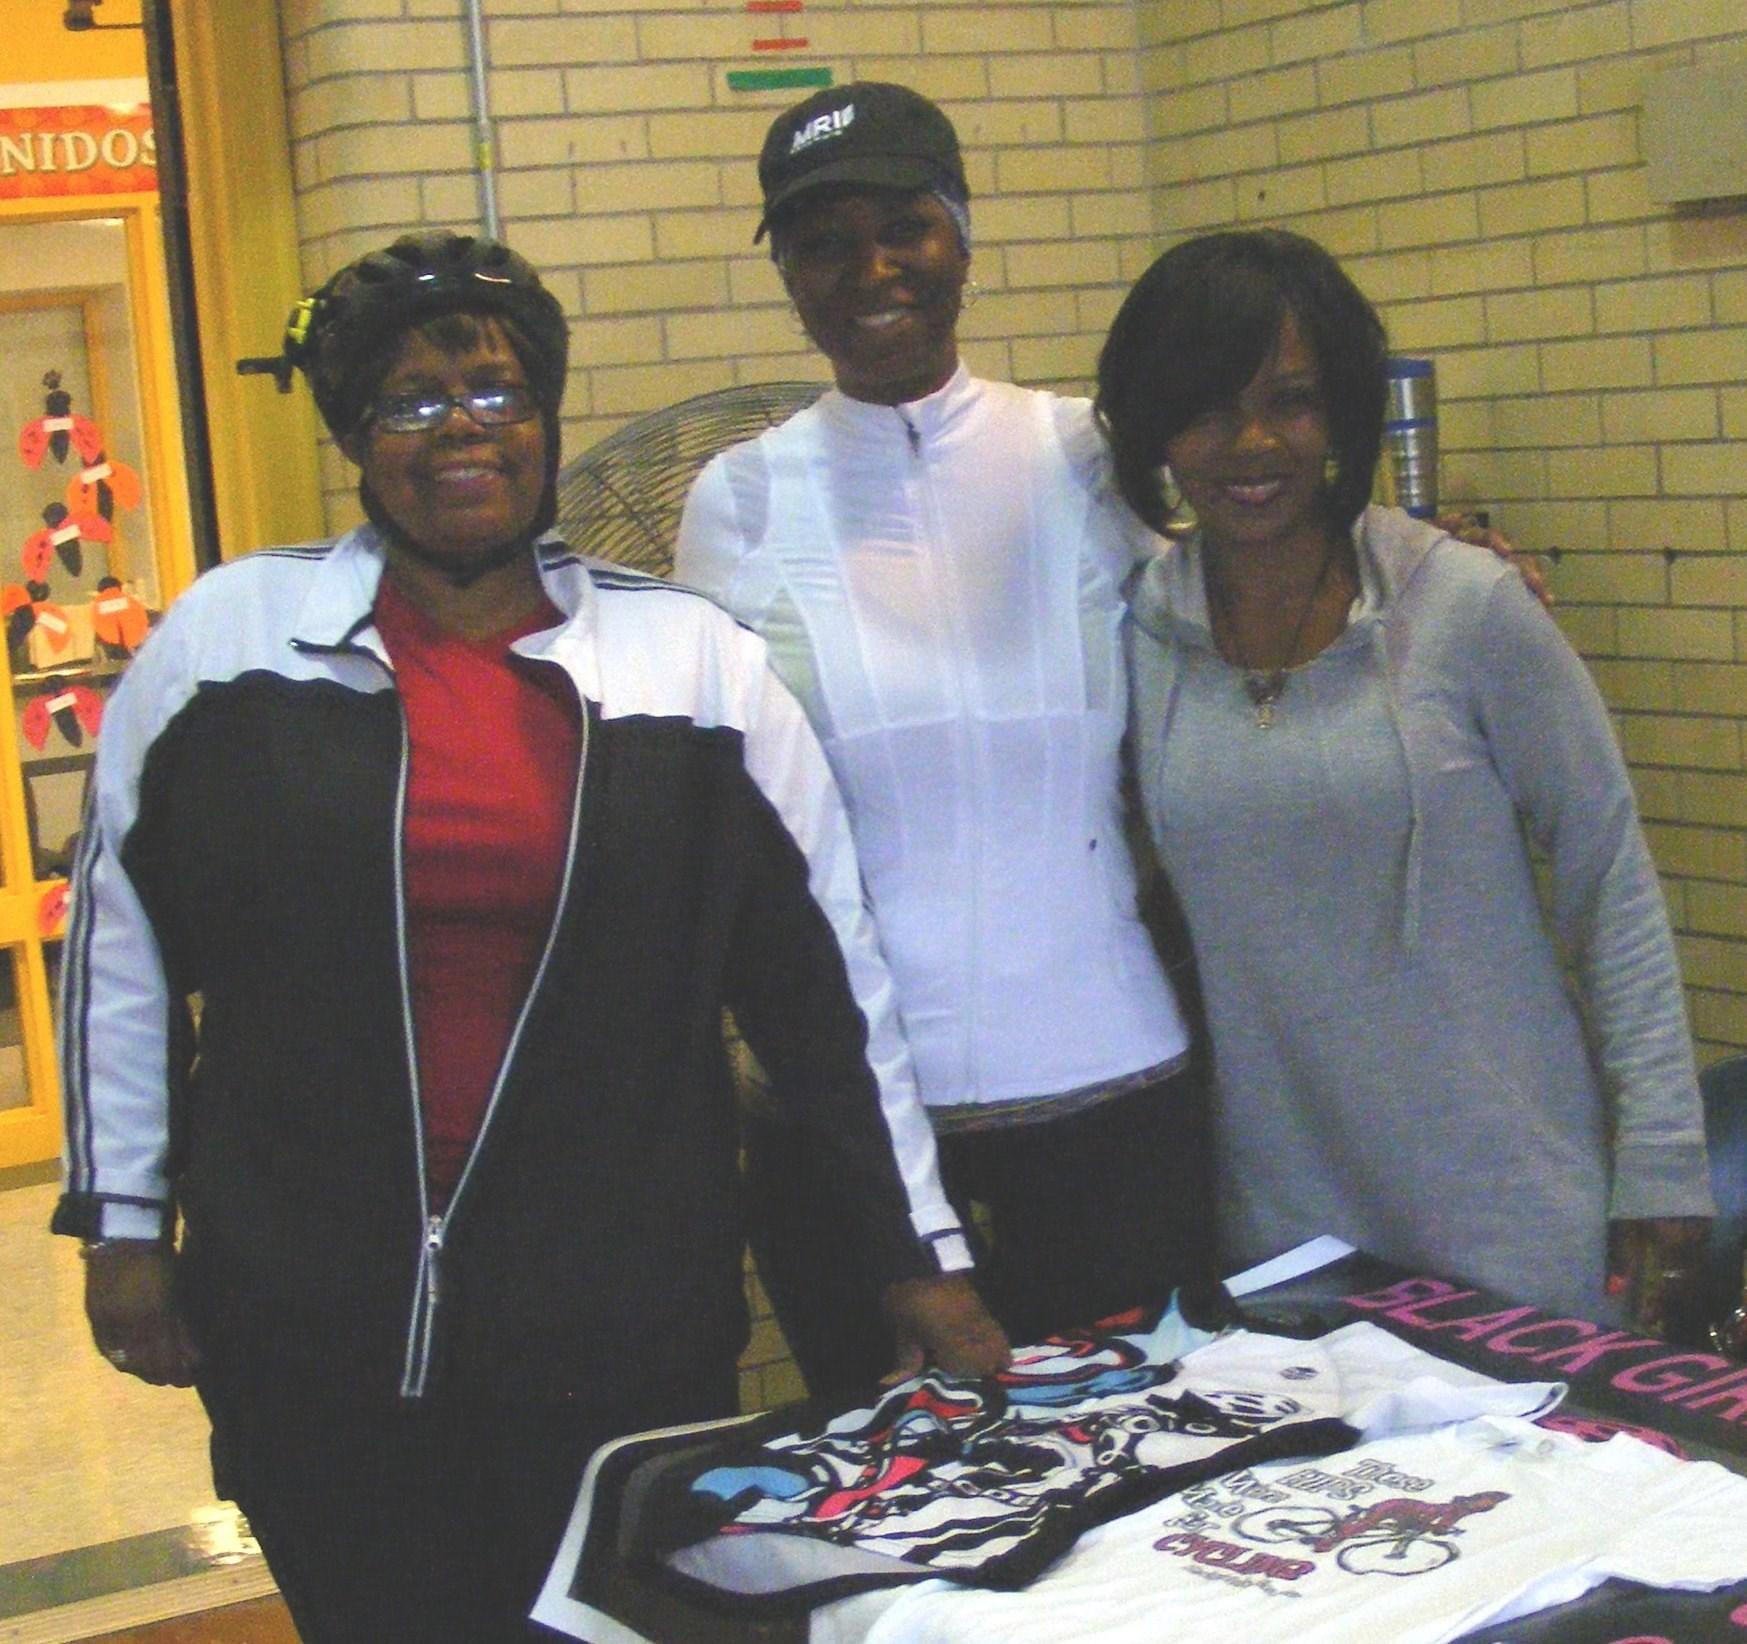 Representatives from Black Girls do Bike hosted an info table